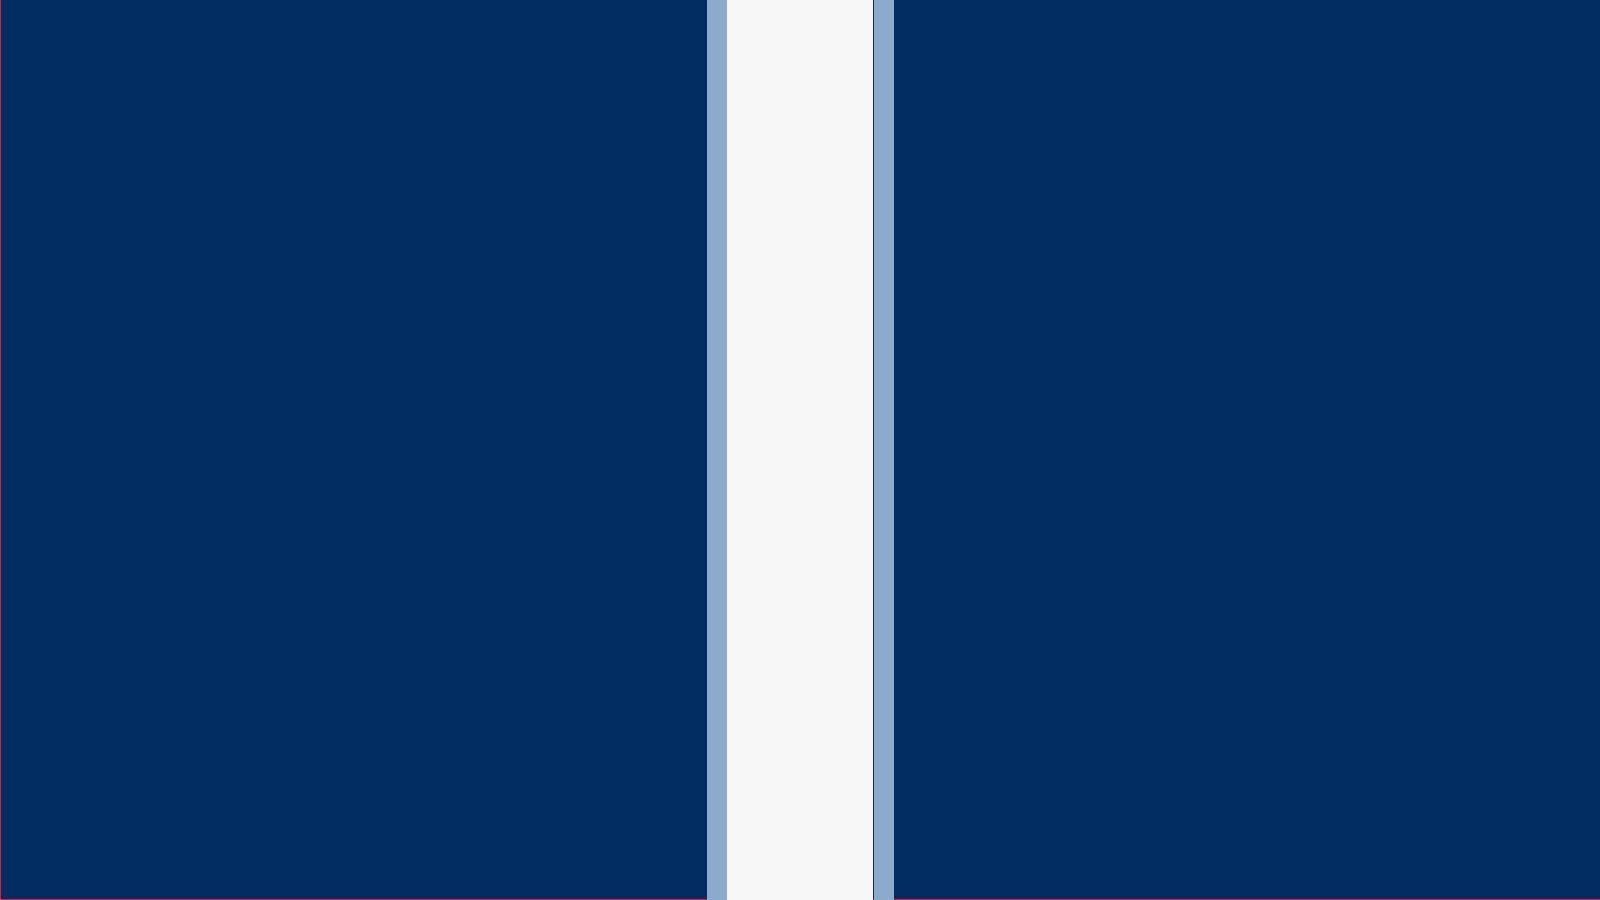 Houston Dynamo at Sporting Kansas City